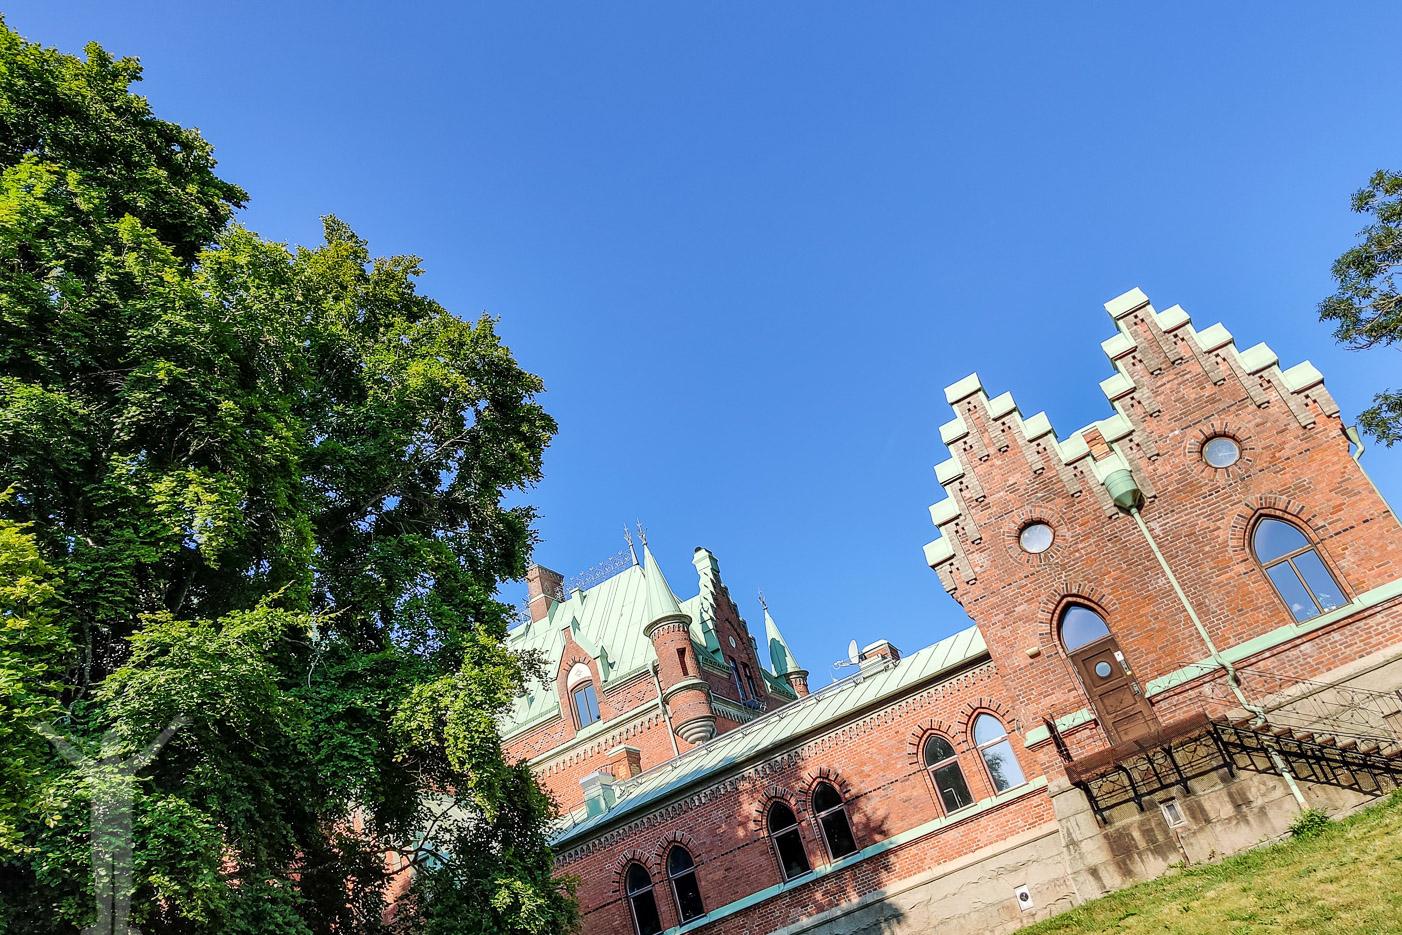 Torreby Golfklubb - slottet